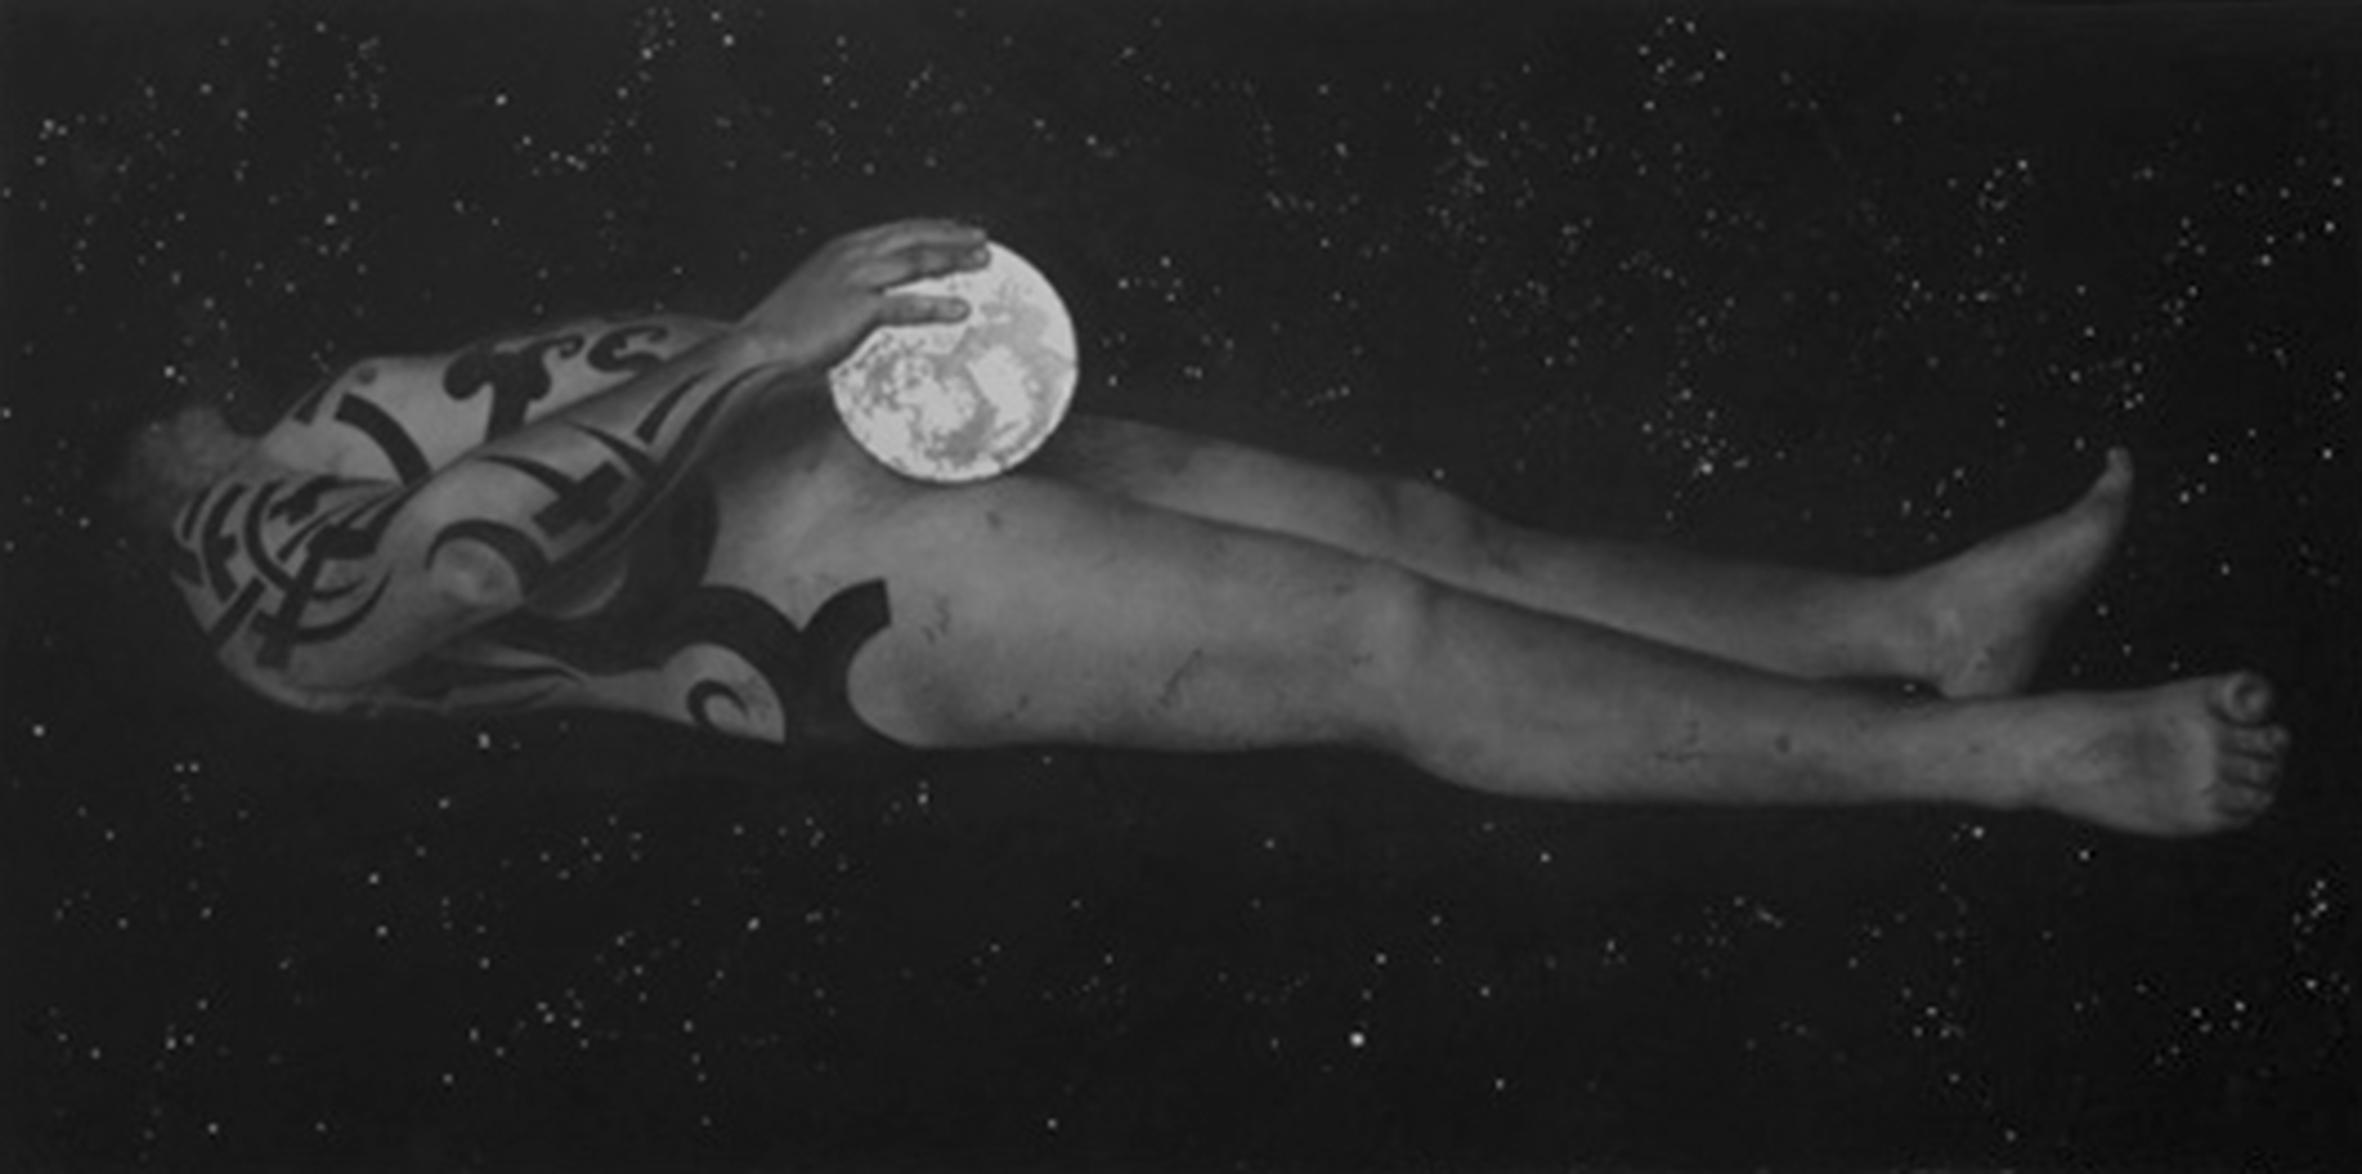 CB_couché_lune_S